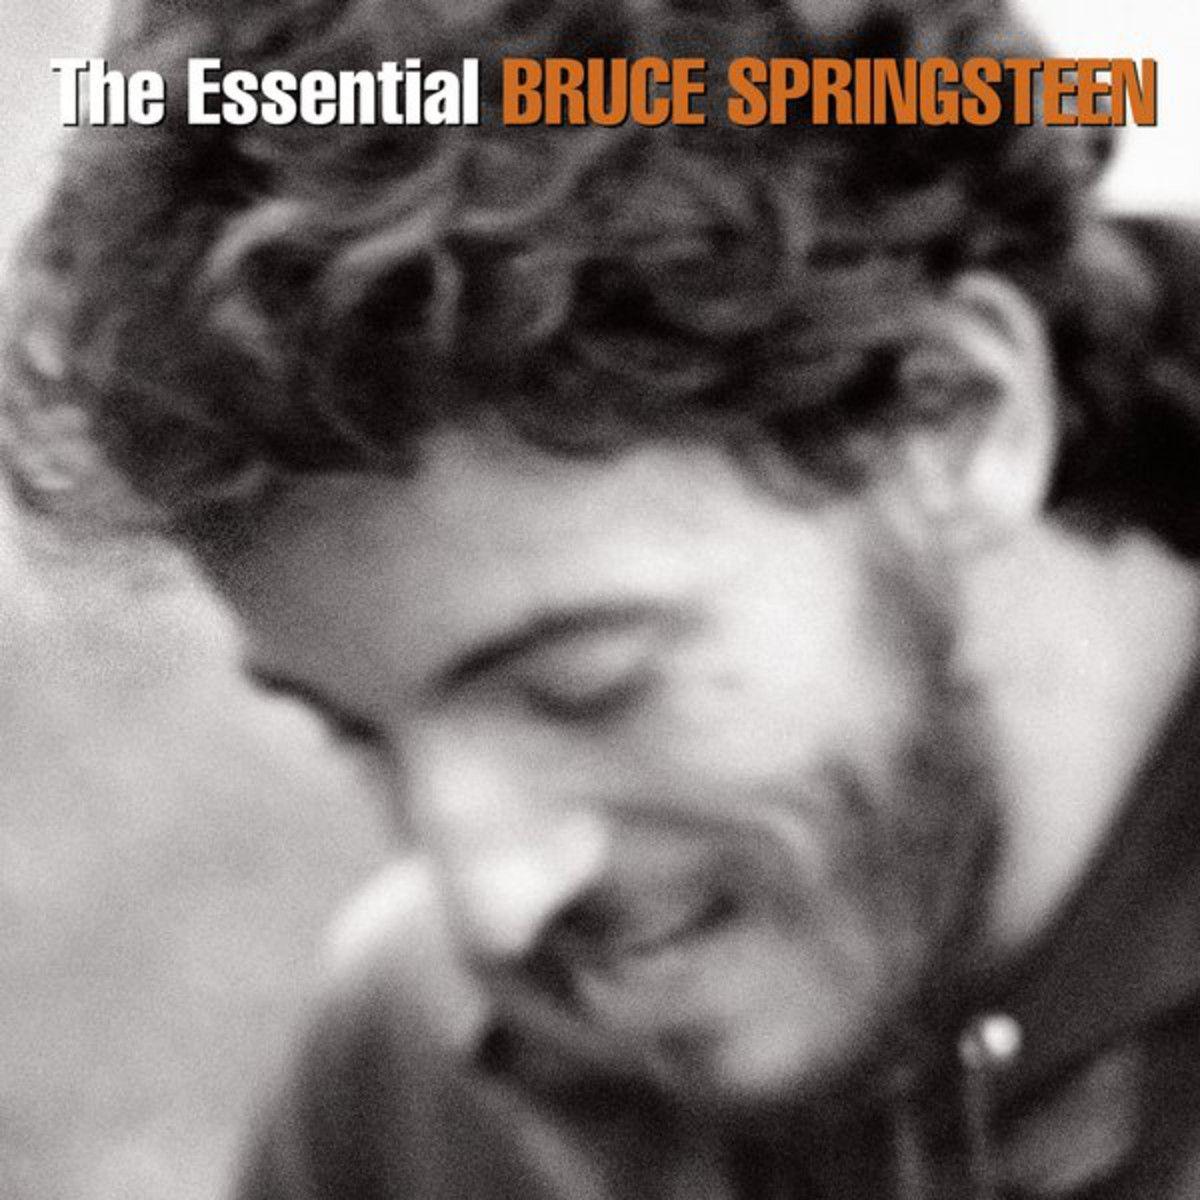 Bruce Springsteen - The Essential album cover